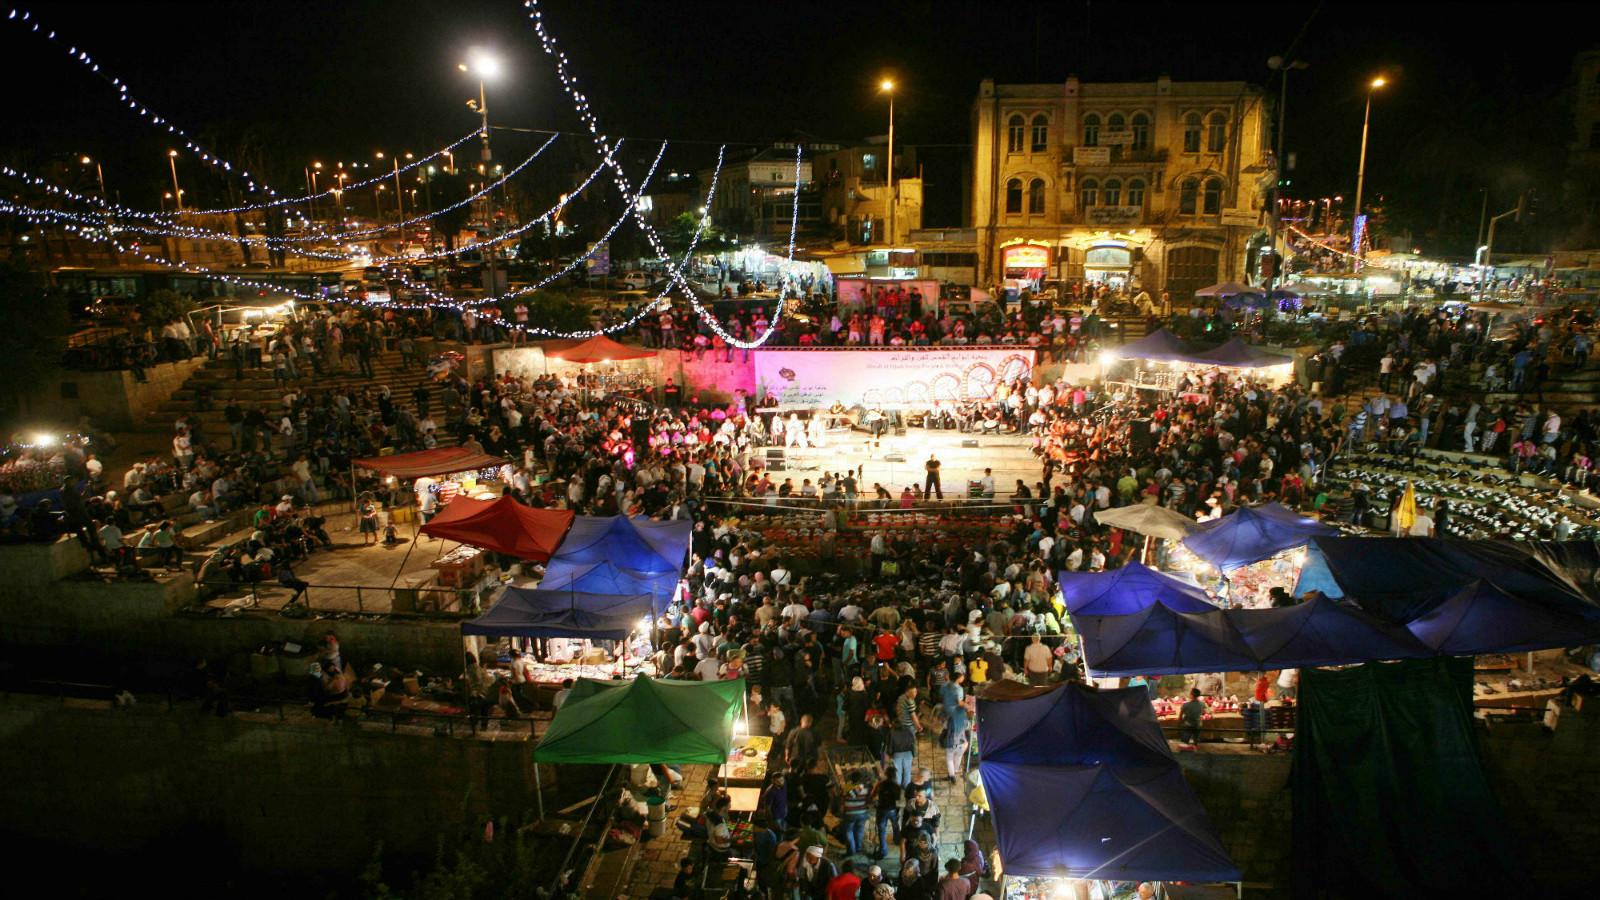 Ramadan nights in the Muslim Quarter of Jerusalem's Old City. Photo by Sliman Khader/FLASH90